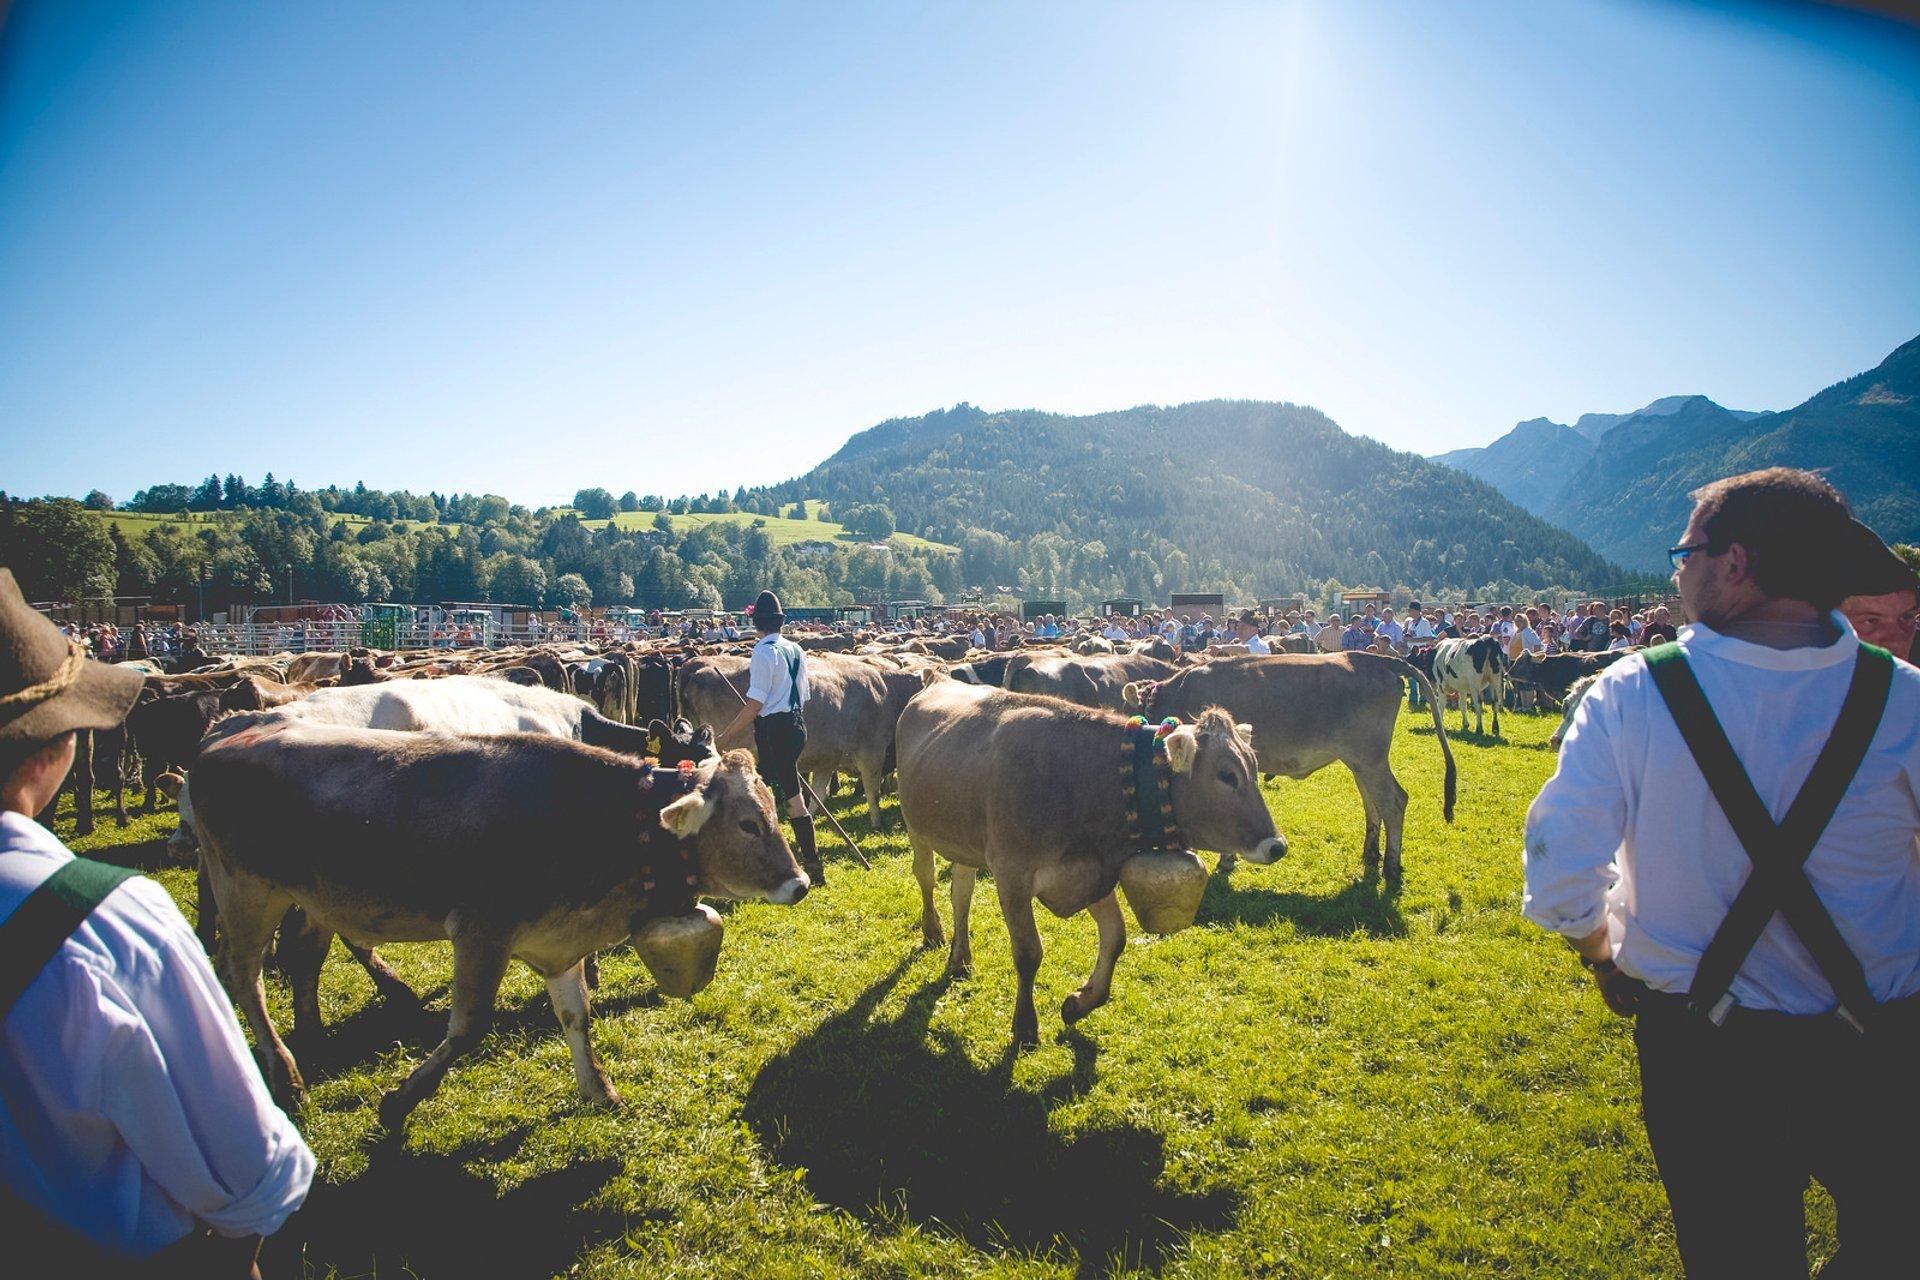 Best time to see Viehscheid in Bavaria 2019